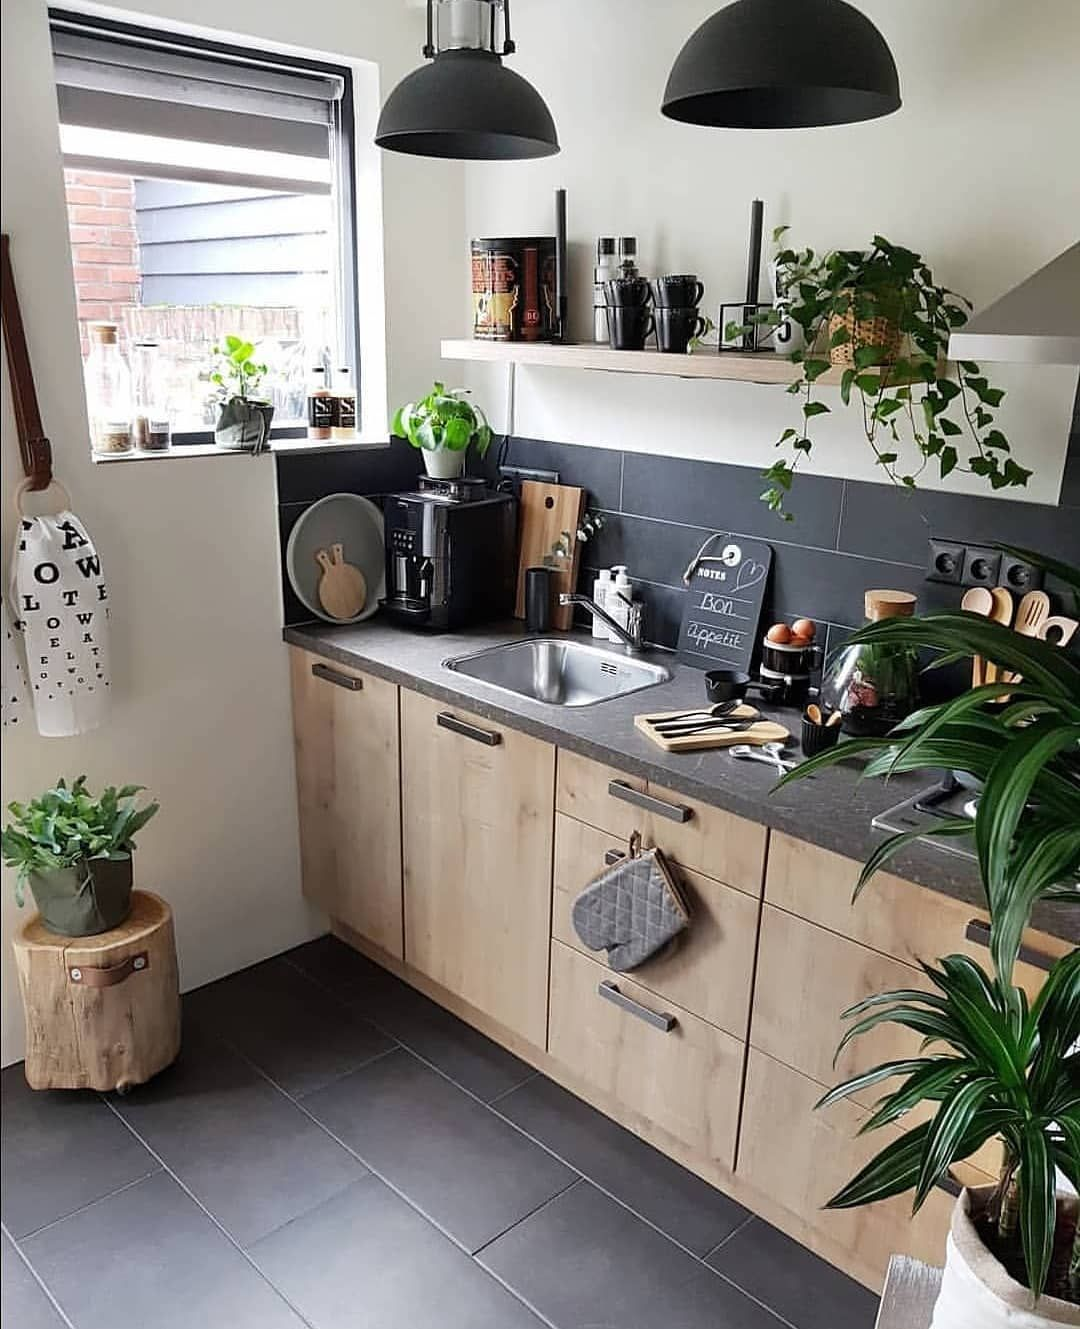 What Does A Kitchen Designer Do: Što Kažete Na Ovu Kuhinju? 🍀💣 .. What Do You Think About